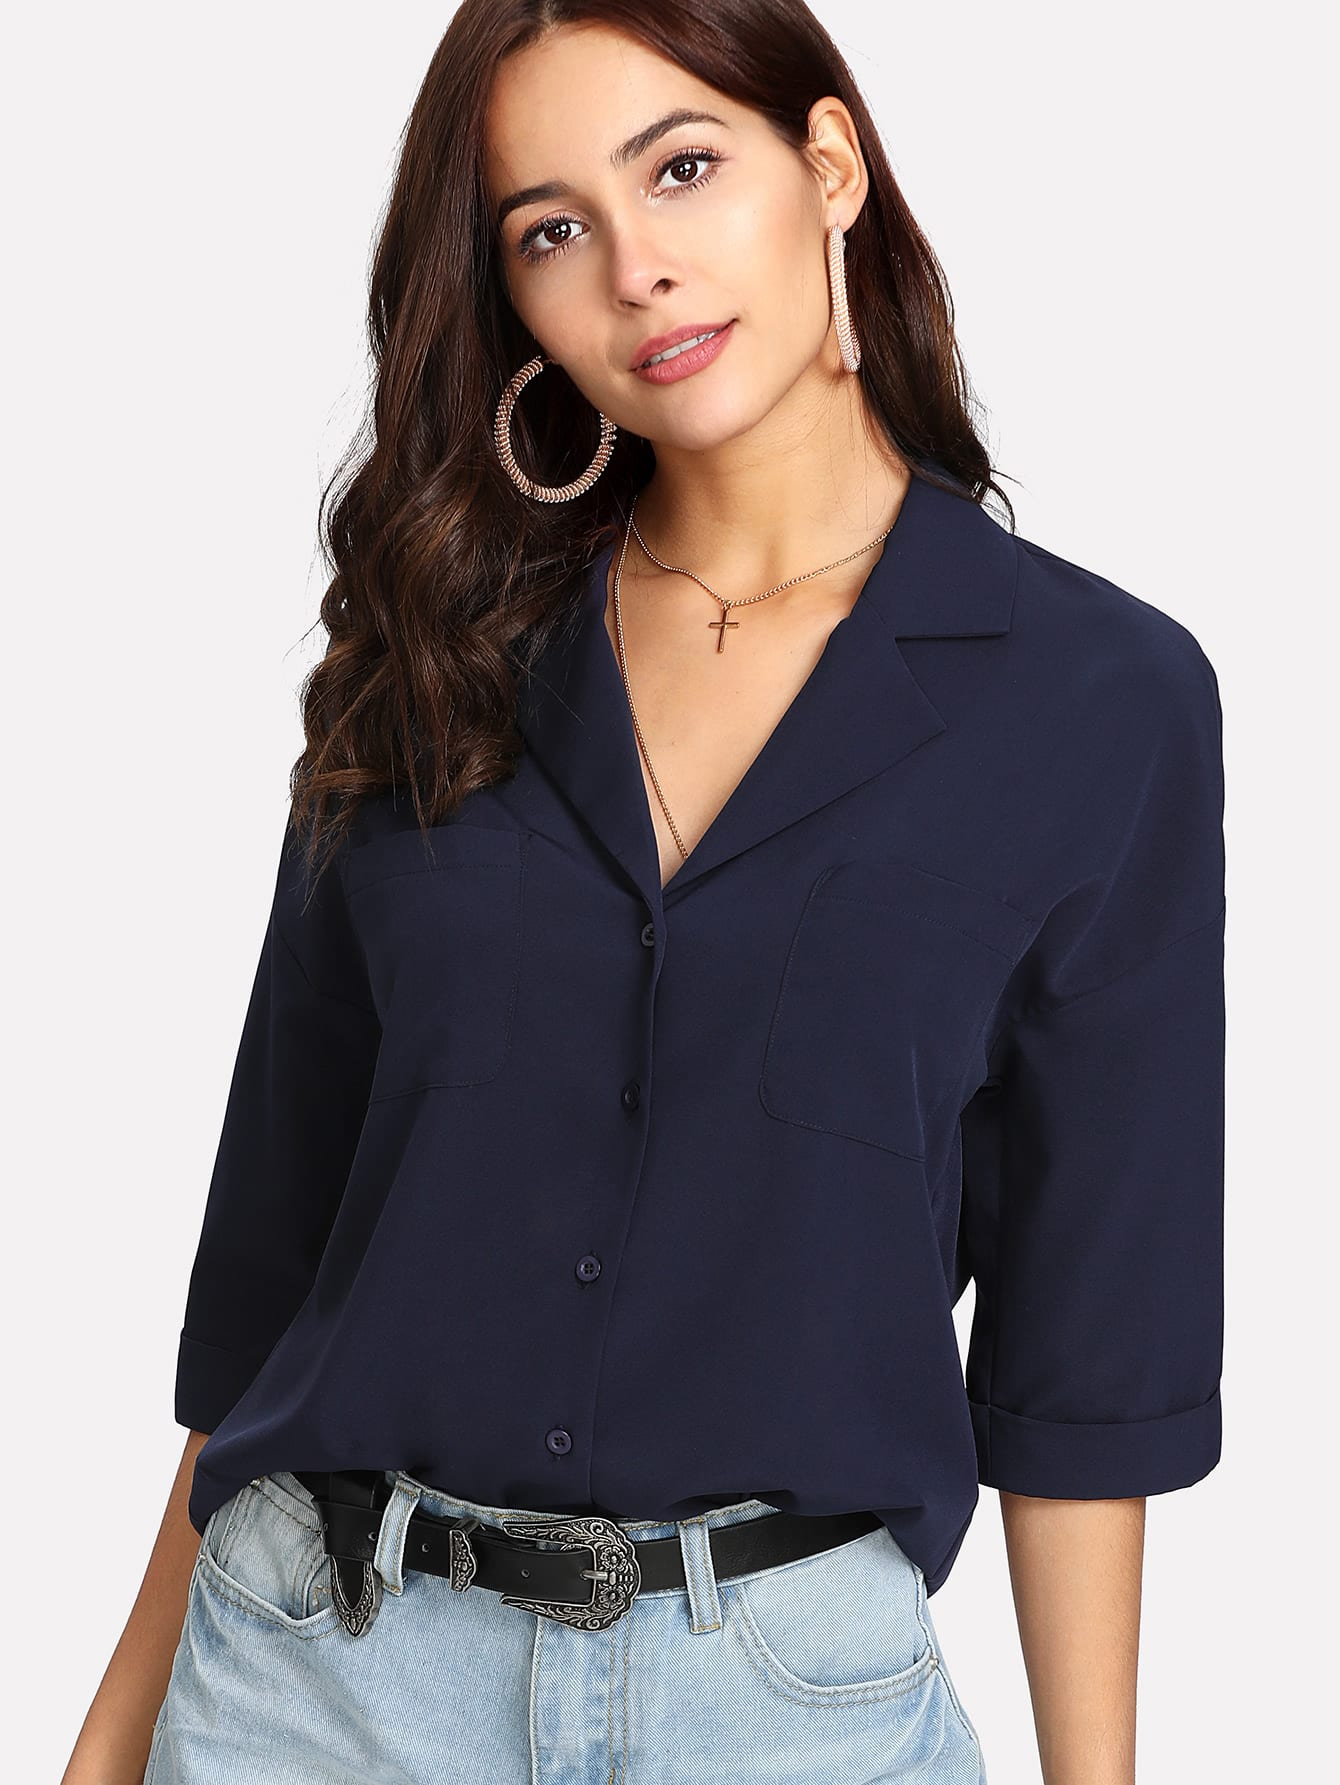 Notch Collar Drop Shoulder Button Up Top